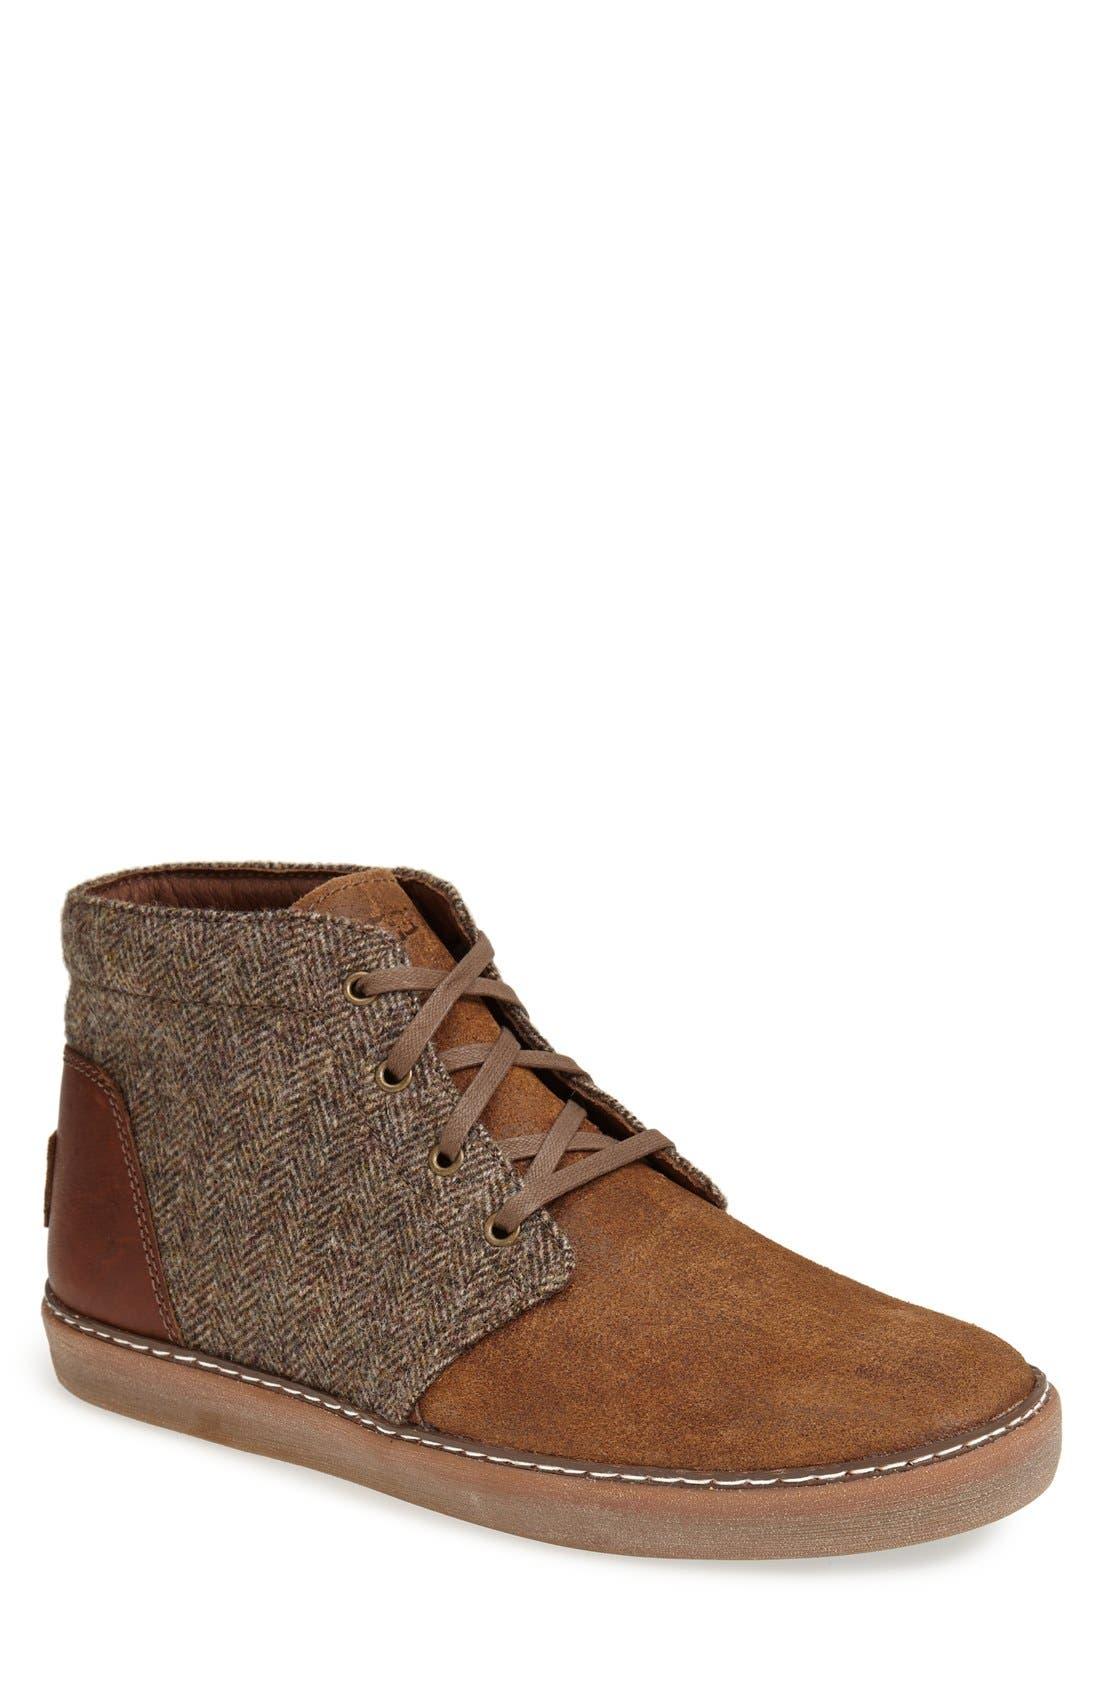 Alternate Image 1 Selected - UGG® 'Alin' Tweed Chukka Boot (Men)